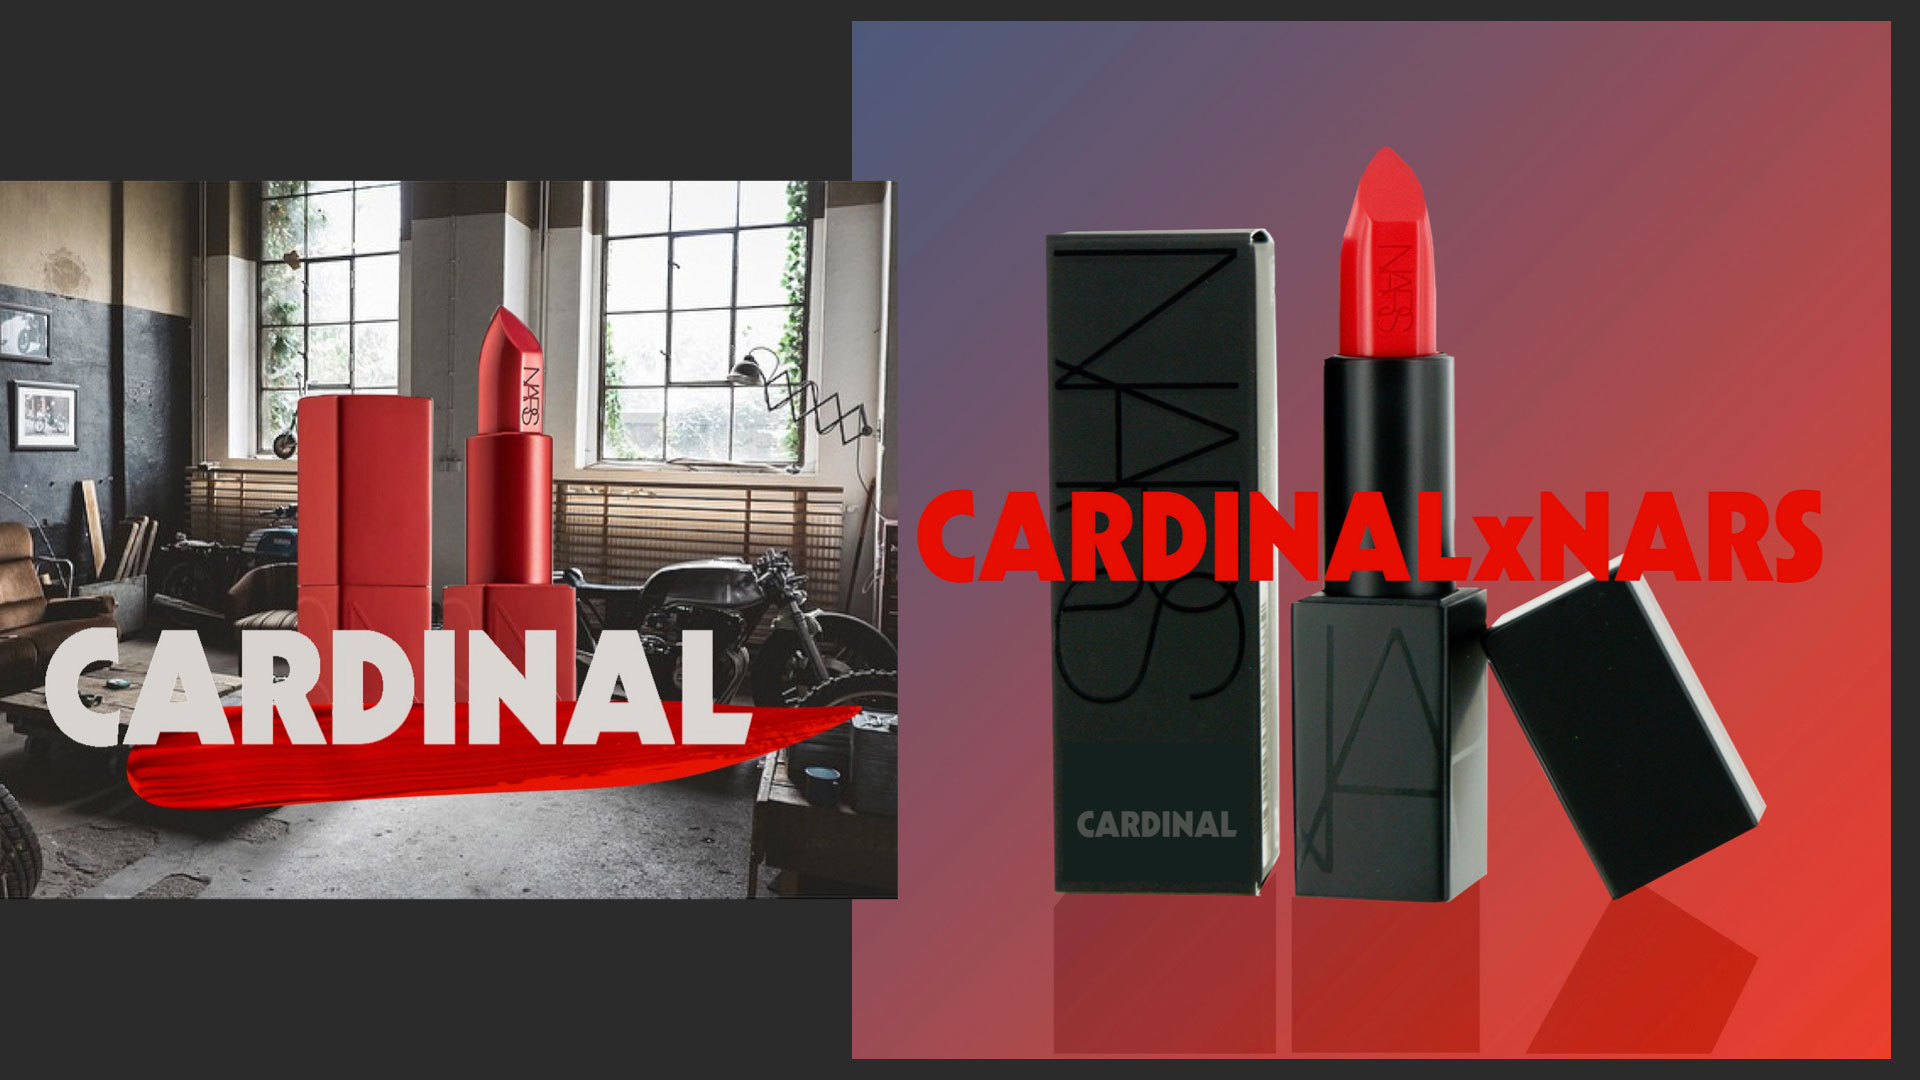 PBX_Cardinal_v11-_Allan-cuts.018.jpg